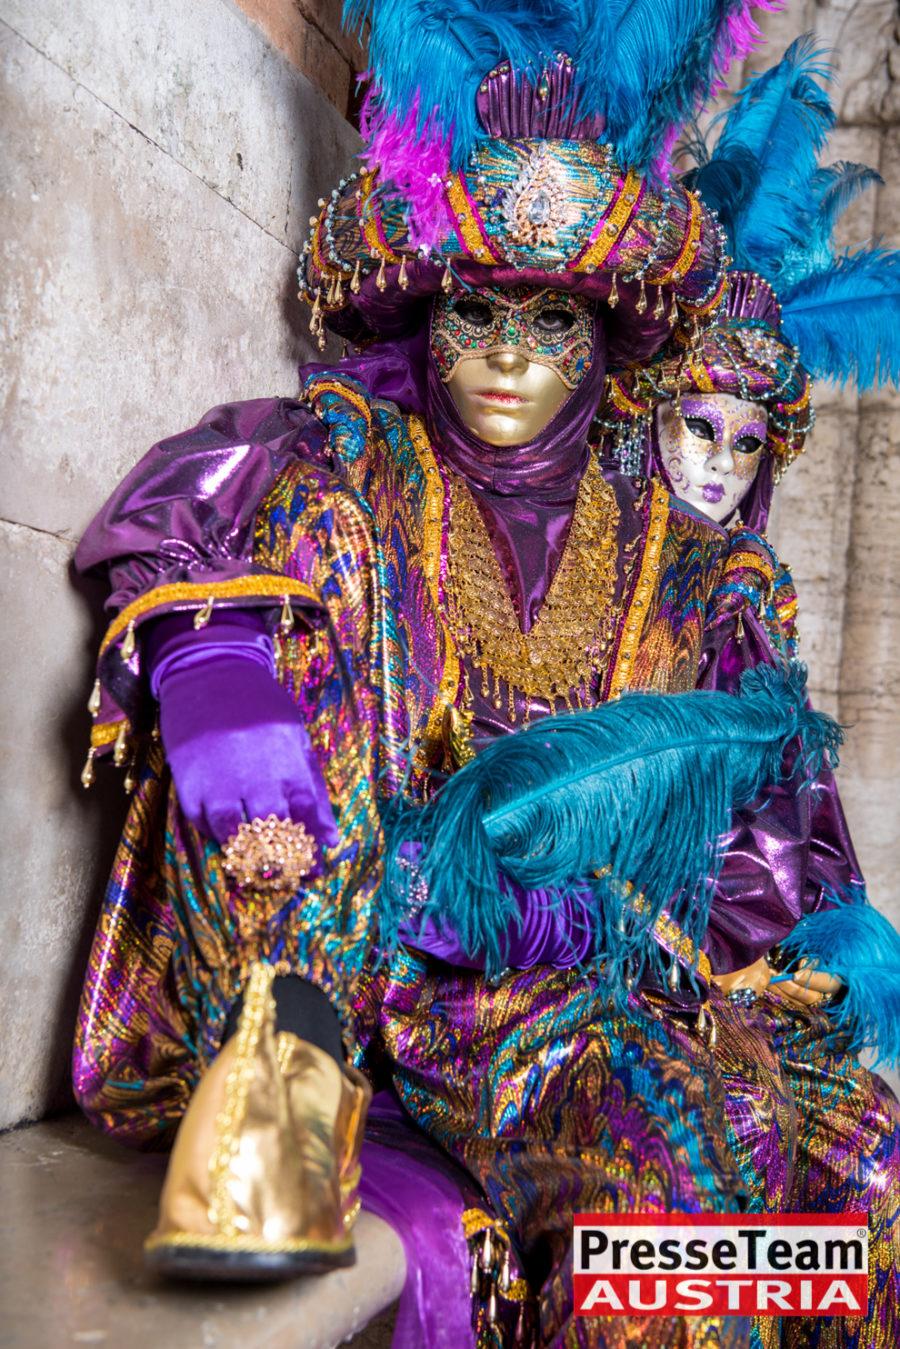 Karneval in Venedig Alexander Mandl 6 - TOP 15 Bilder Karneval in Venedig 2017